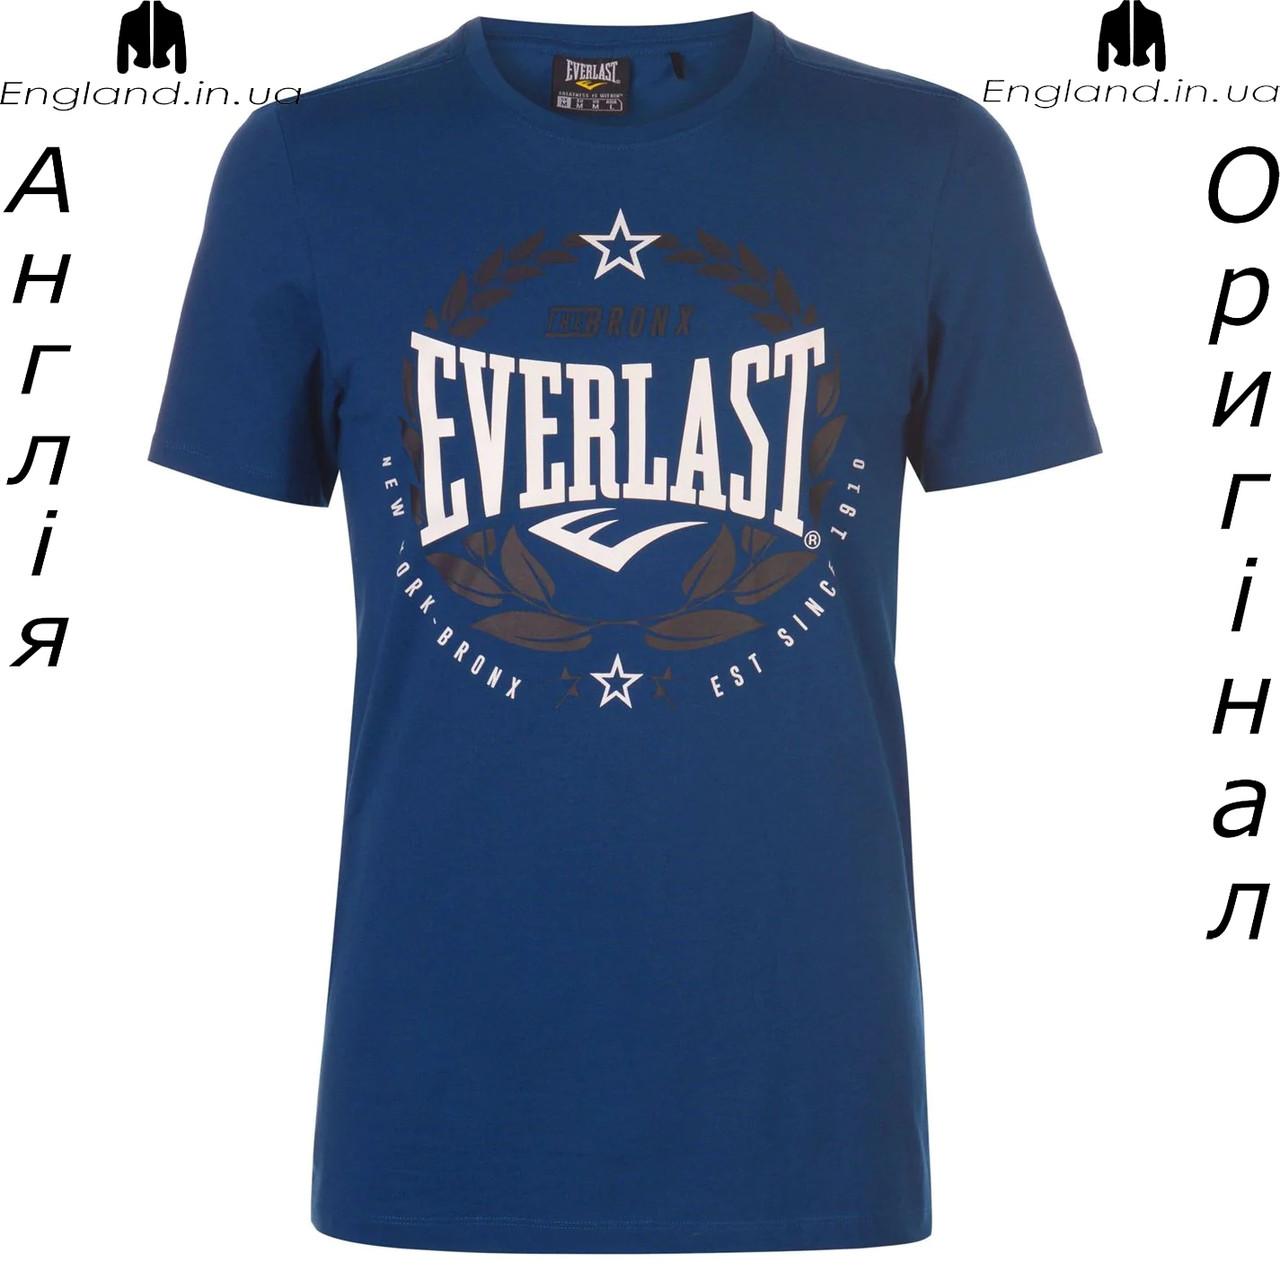 Футболка мужская Everlast из Англии